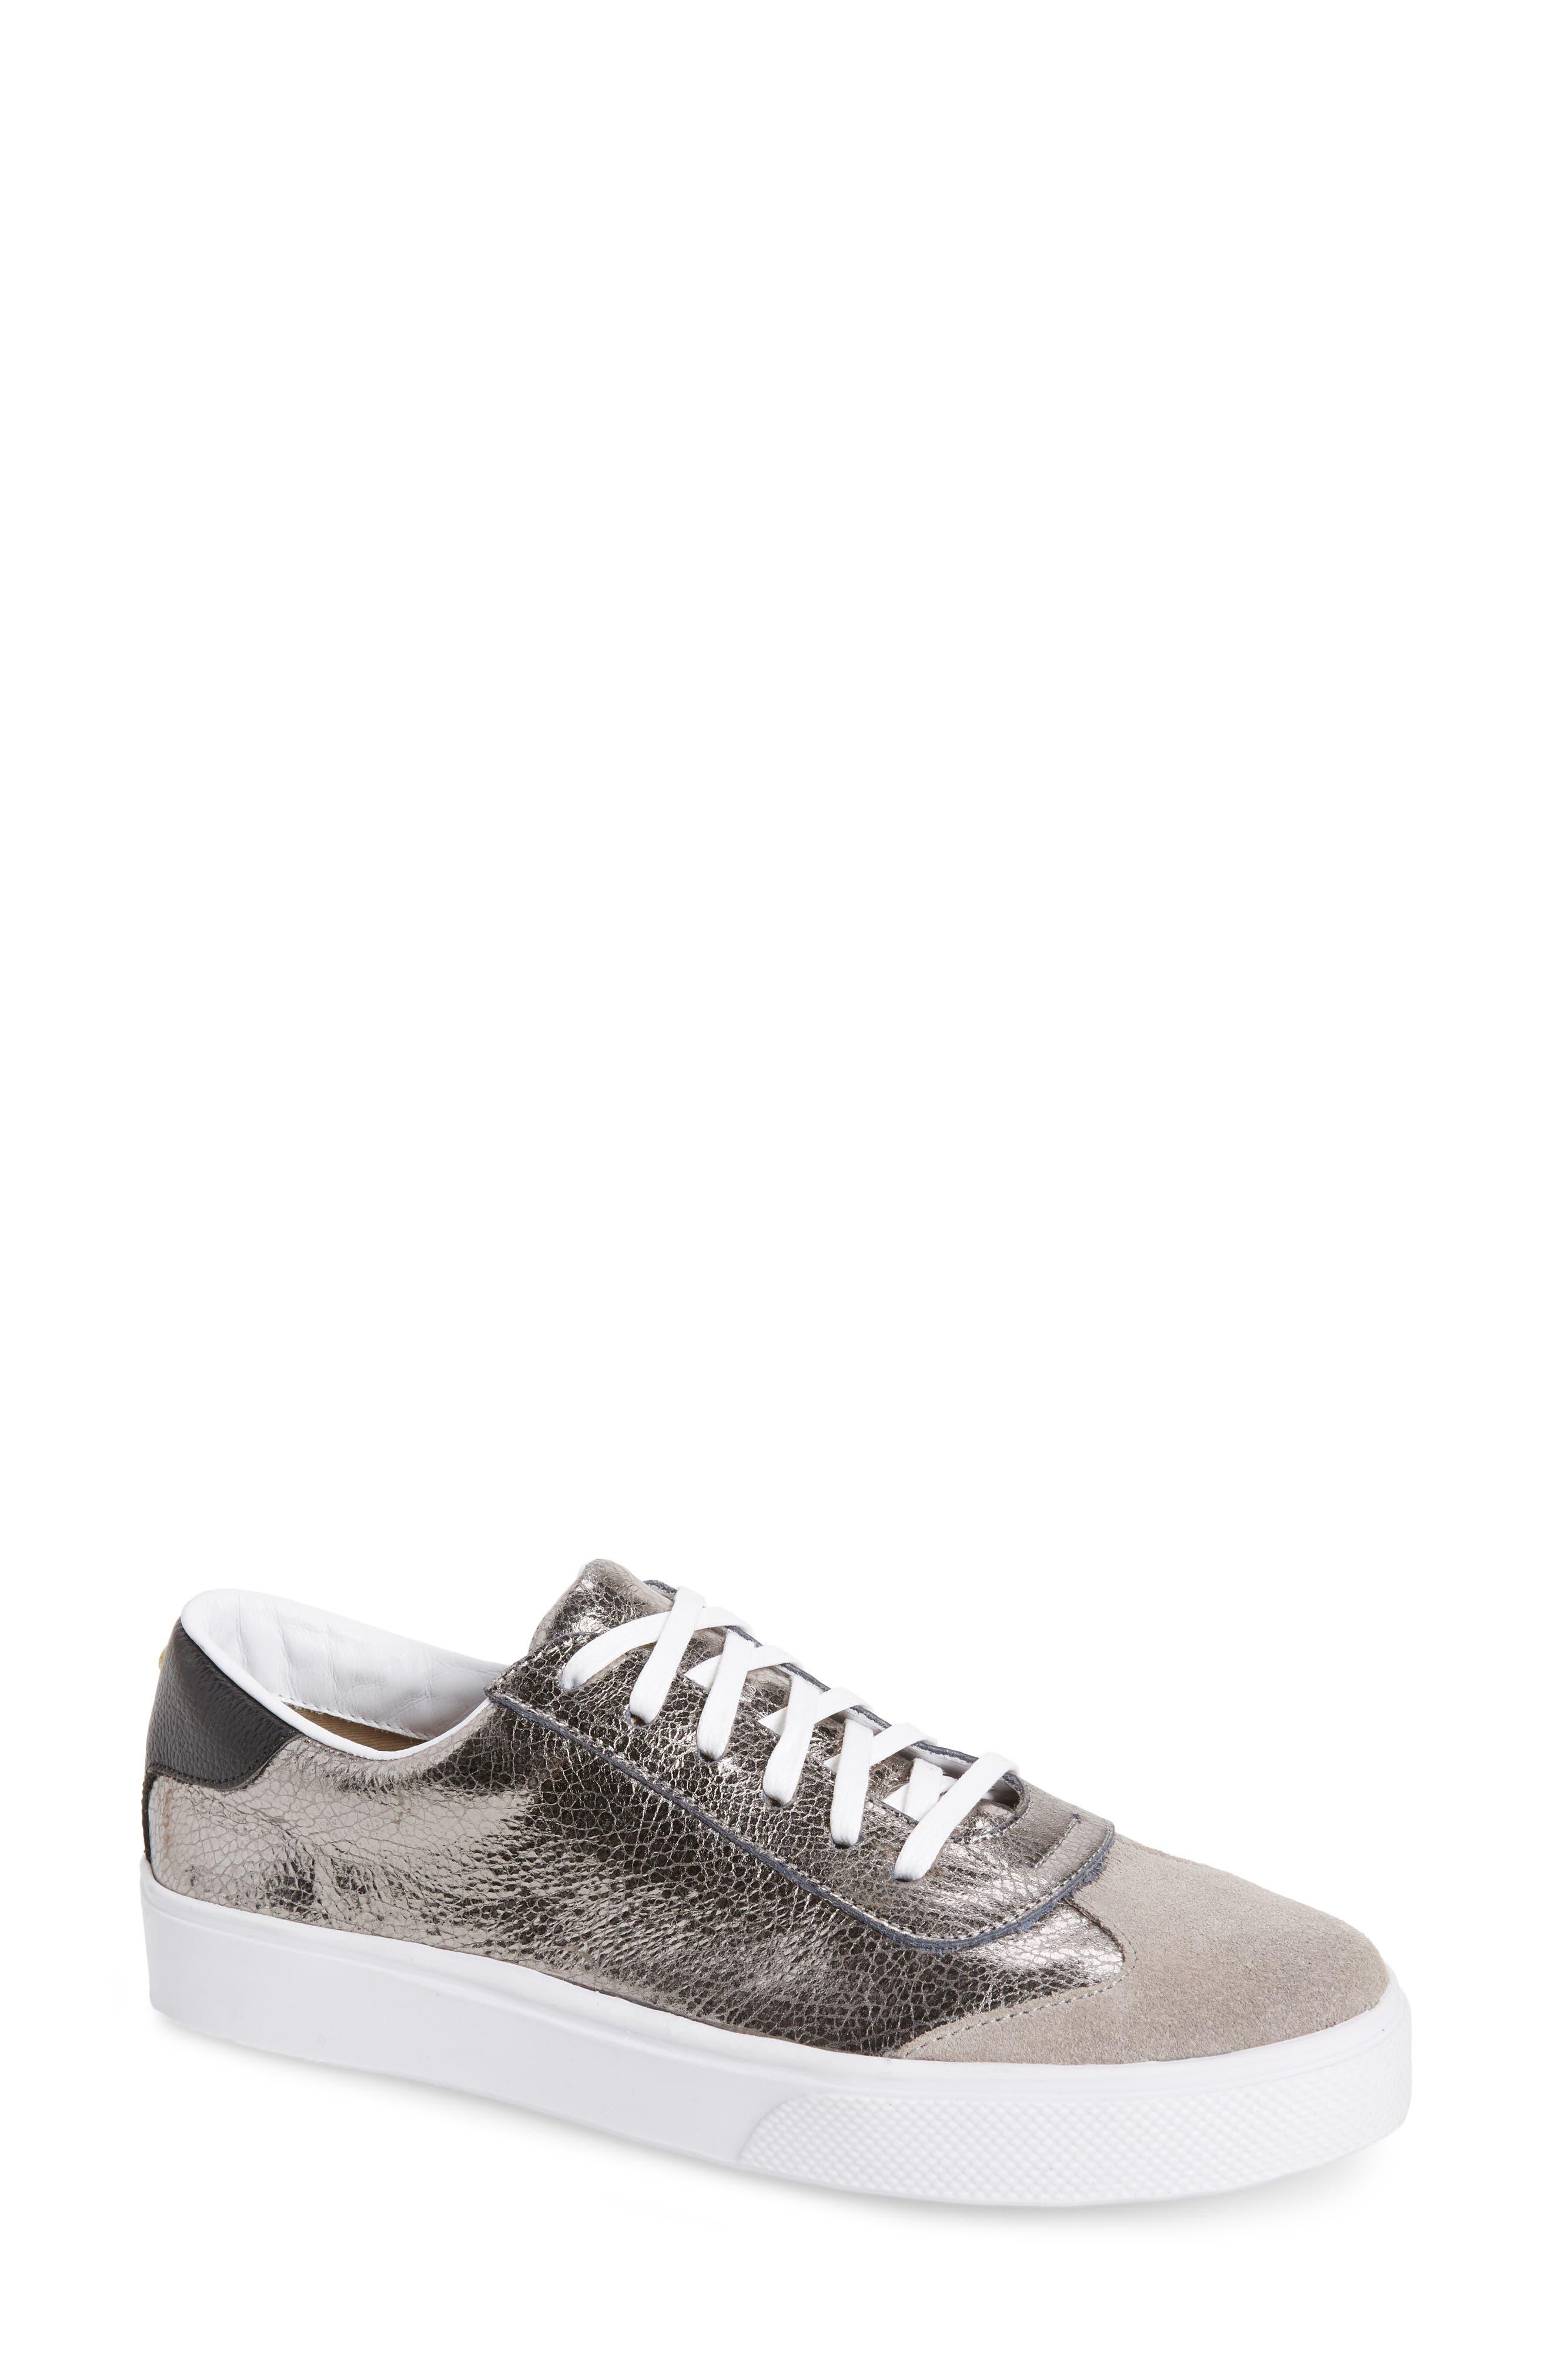 KAANAS Cambridge Sneaker in Gunmetal Leather